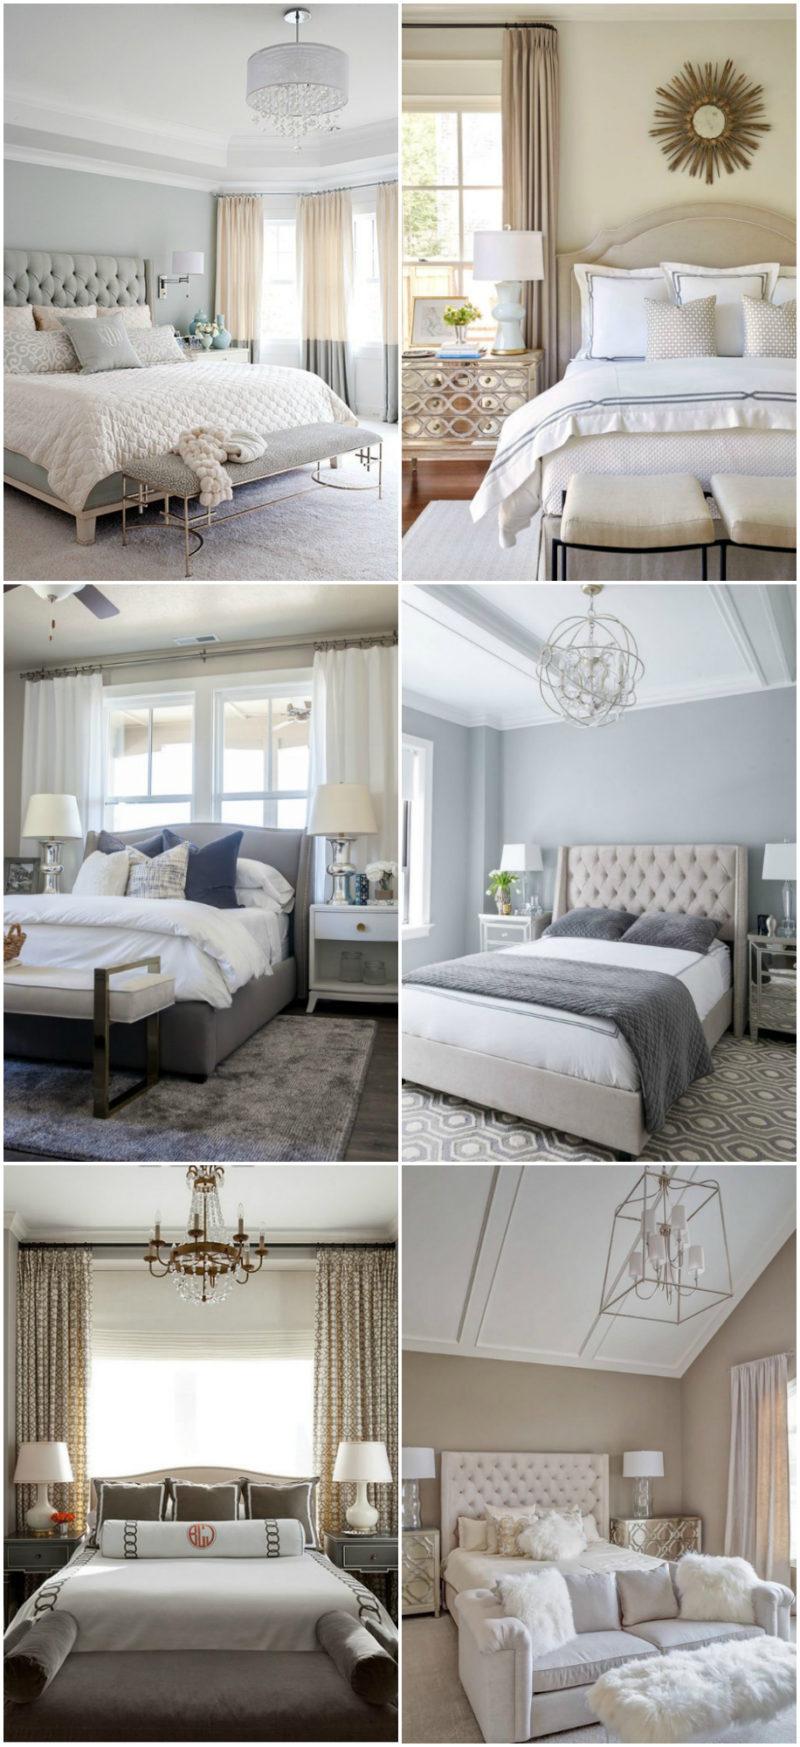 Bedroom home decor inspiration medicine manicures - Pinterest home interiors inspirations ...